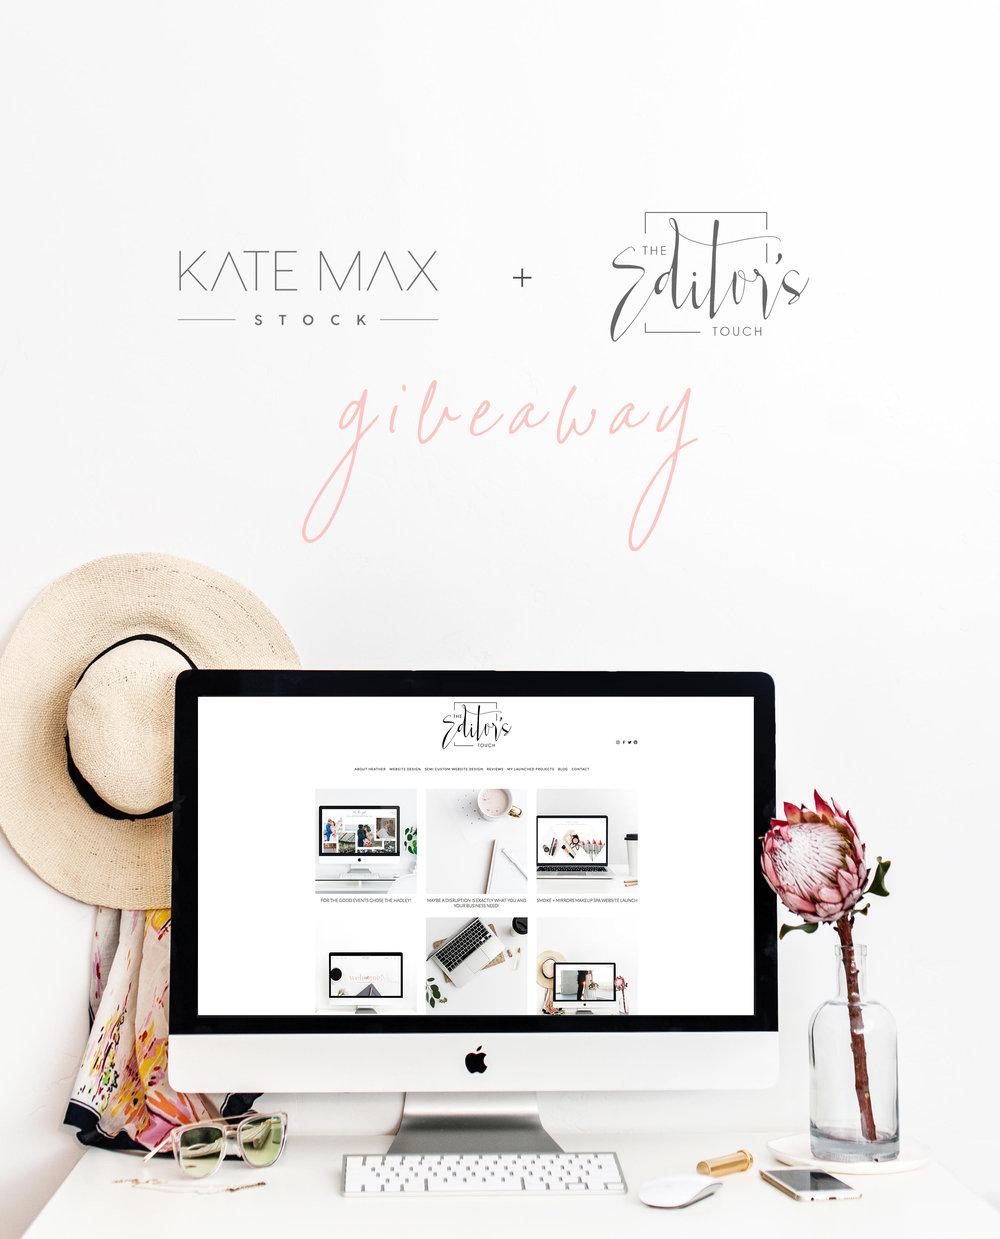 giveaway_katemaxstock.jpg